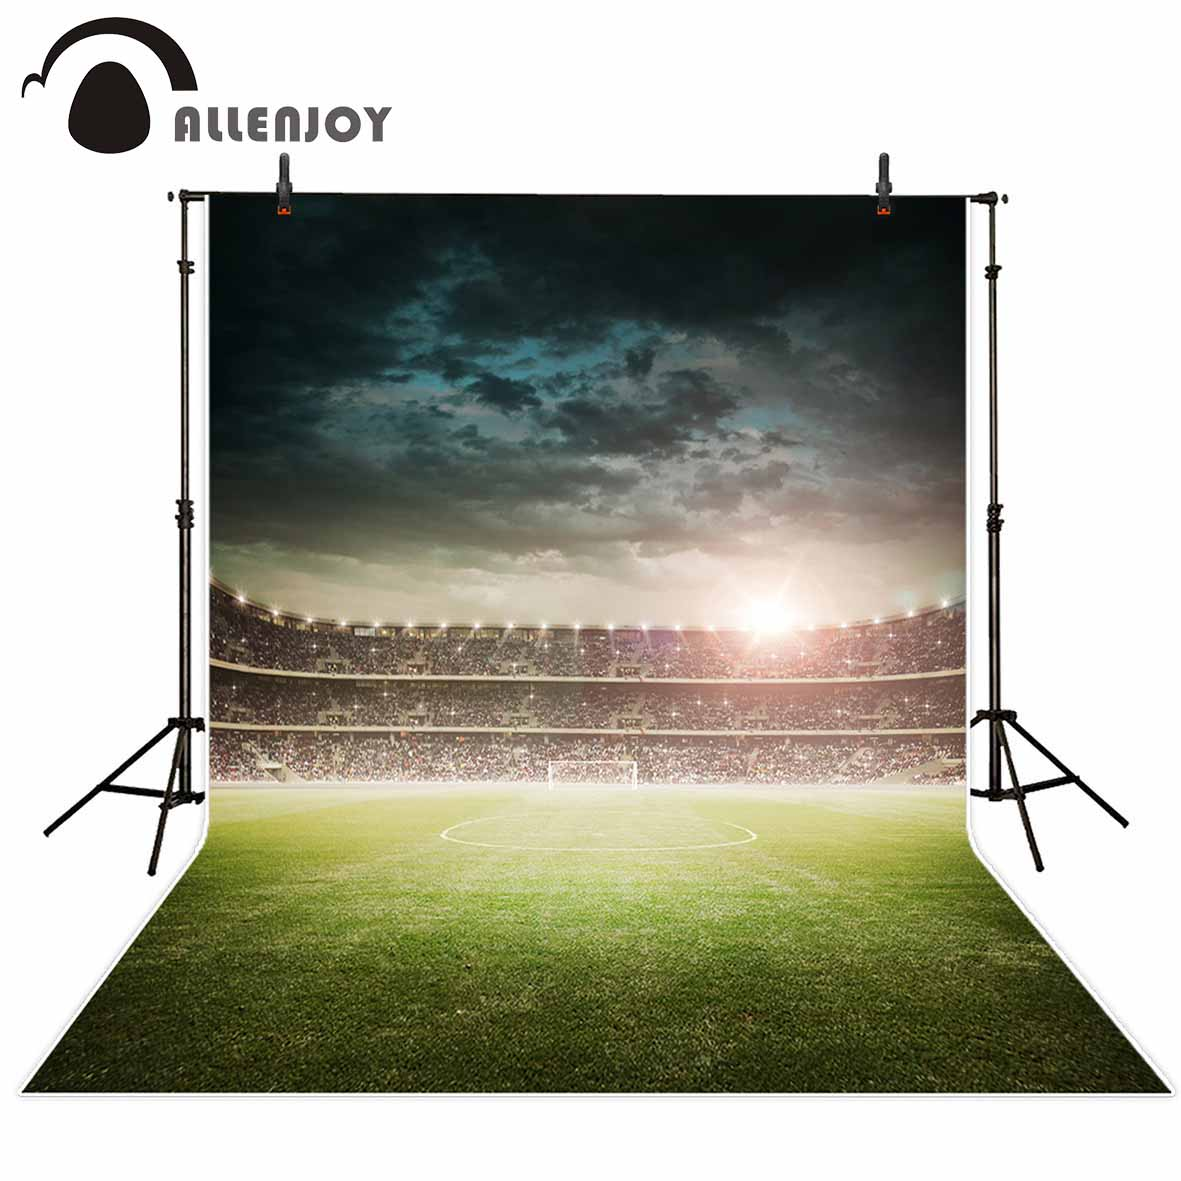 Allenjoy photography backdrop Classic black stadium competition football background newborn original design for photo studio